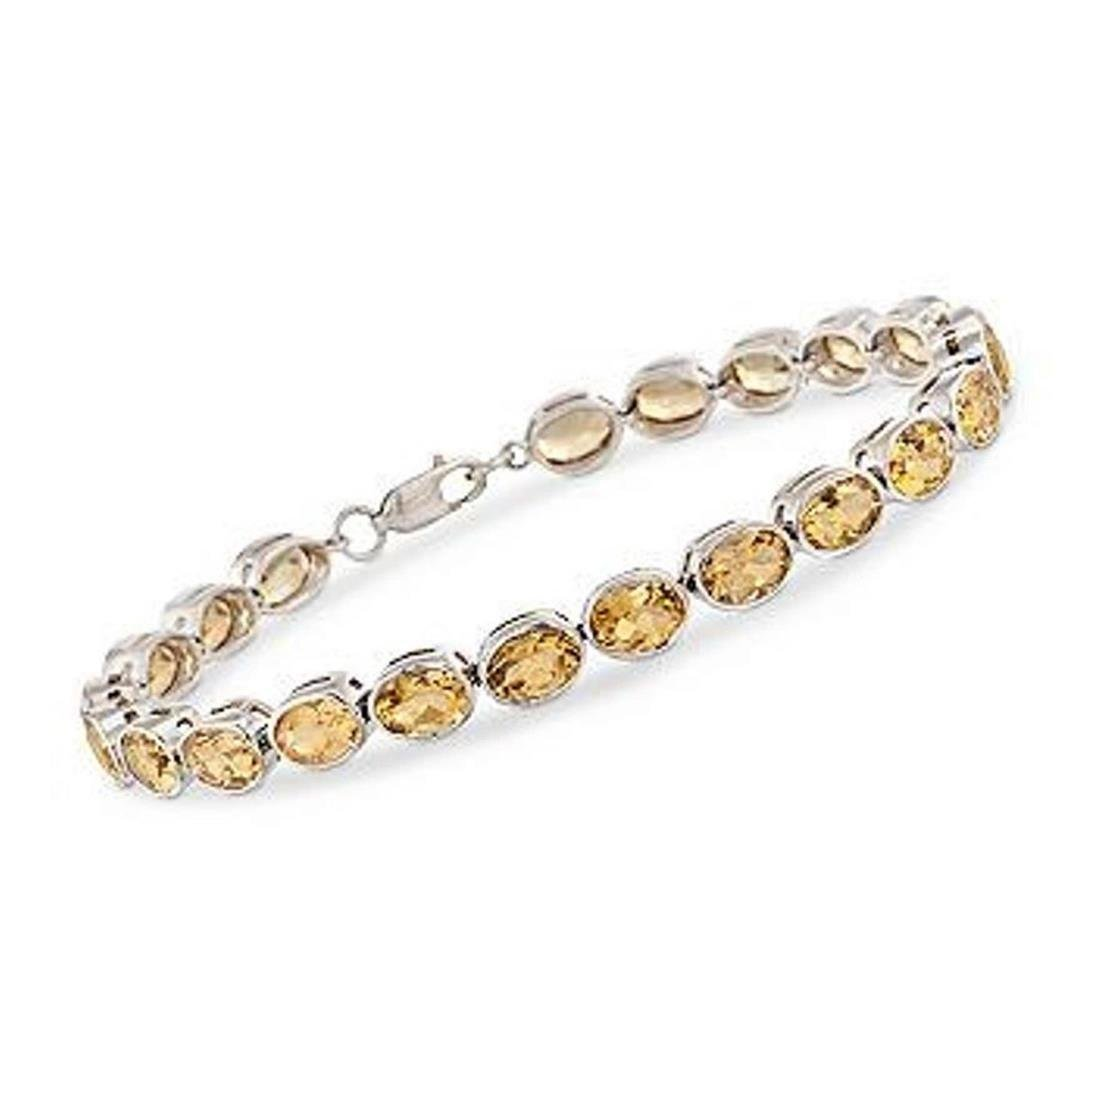 17.00 ct. t.w. Citrine Tennis Bracelet in Sterling